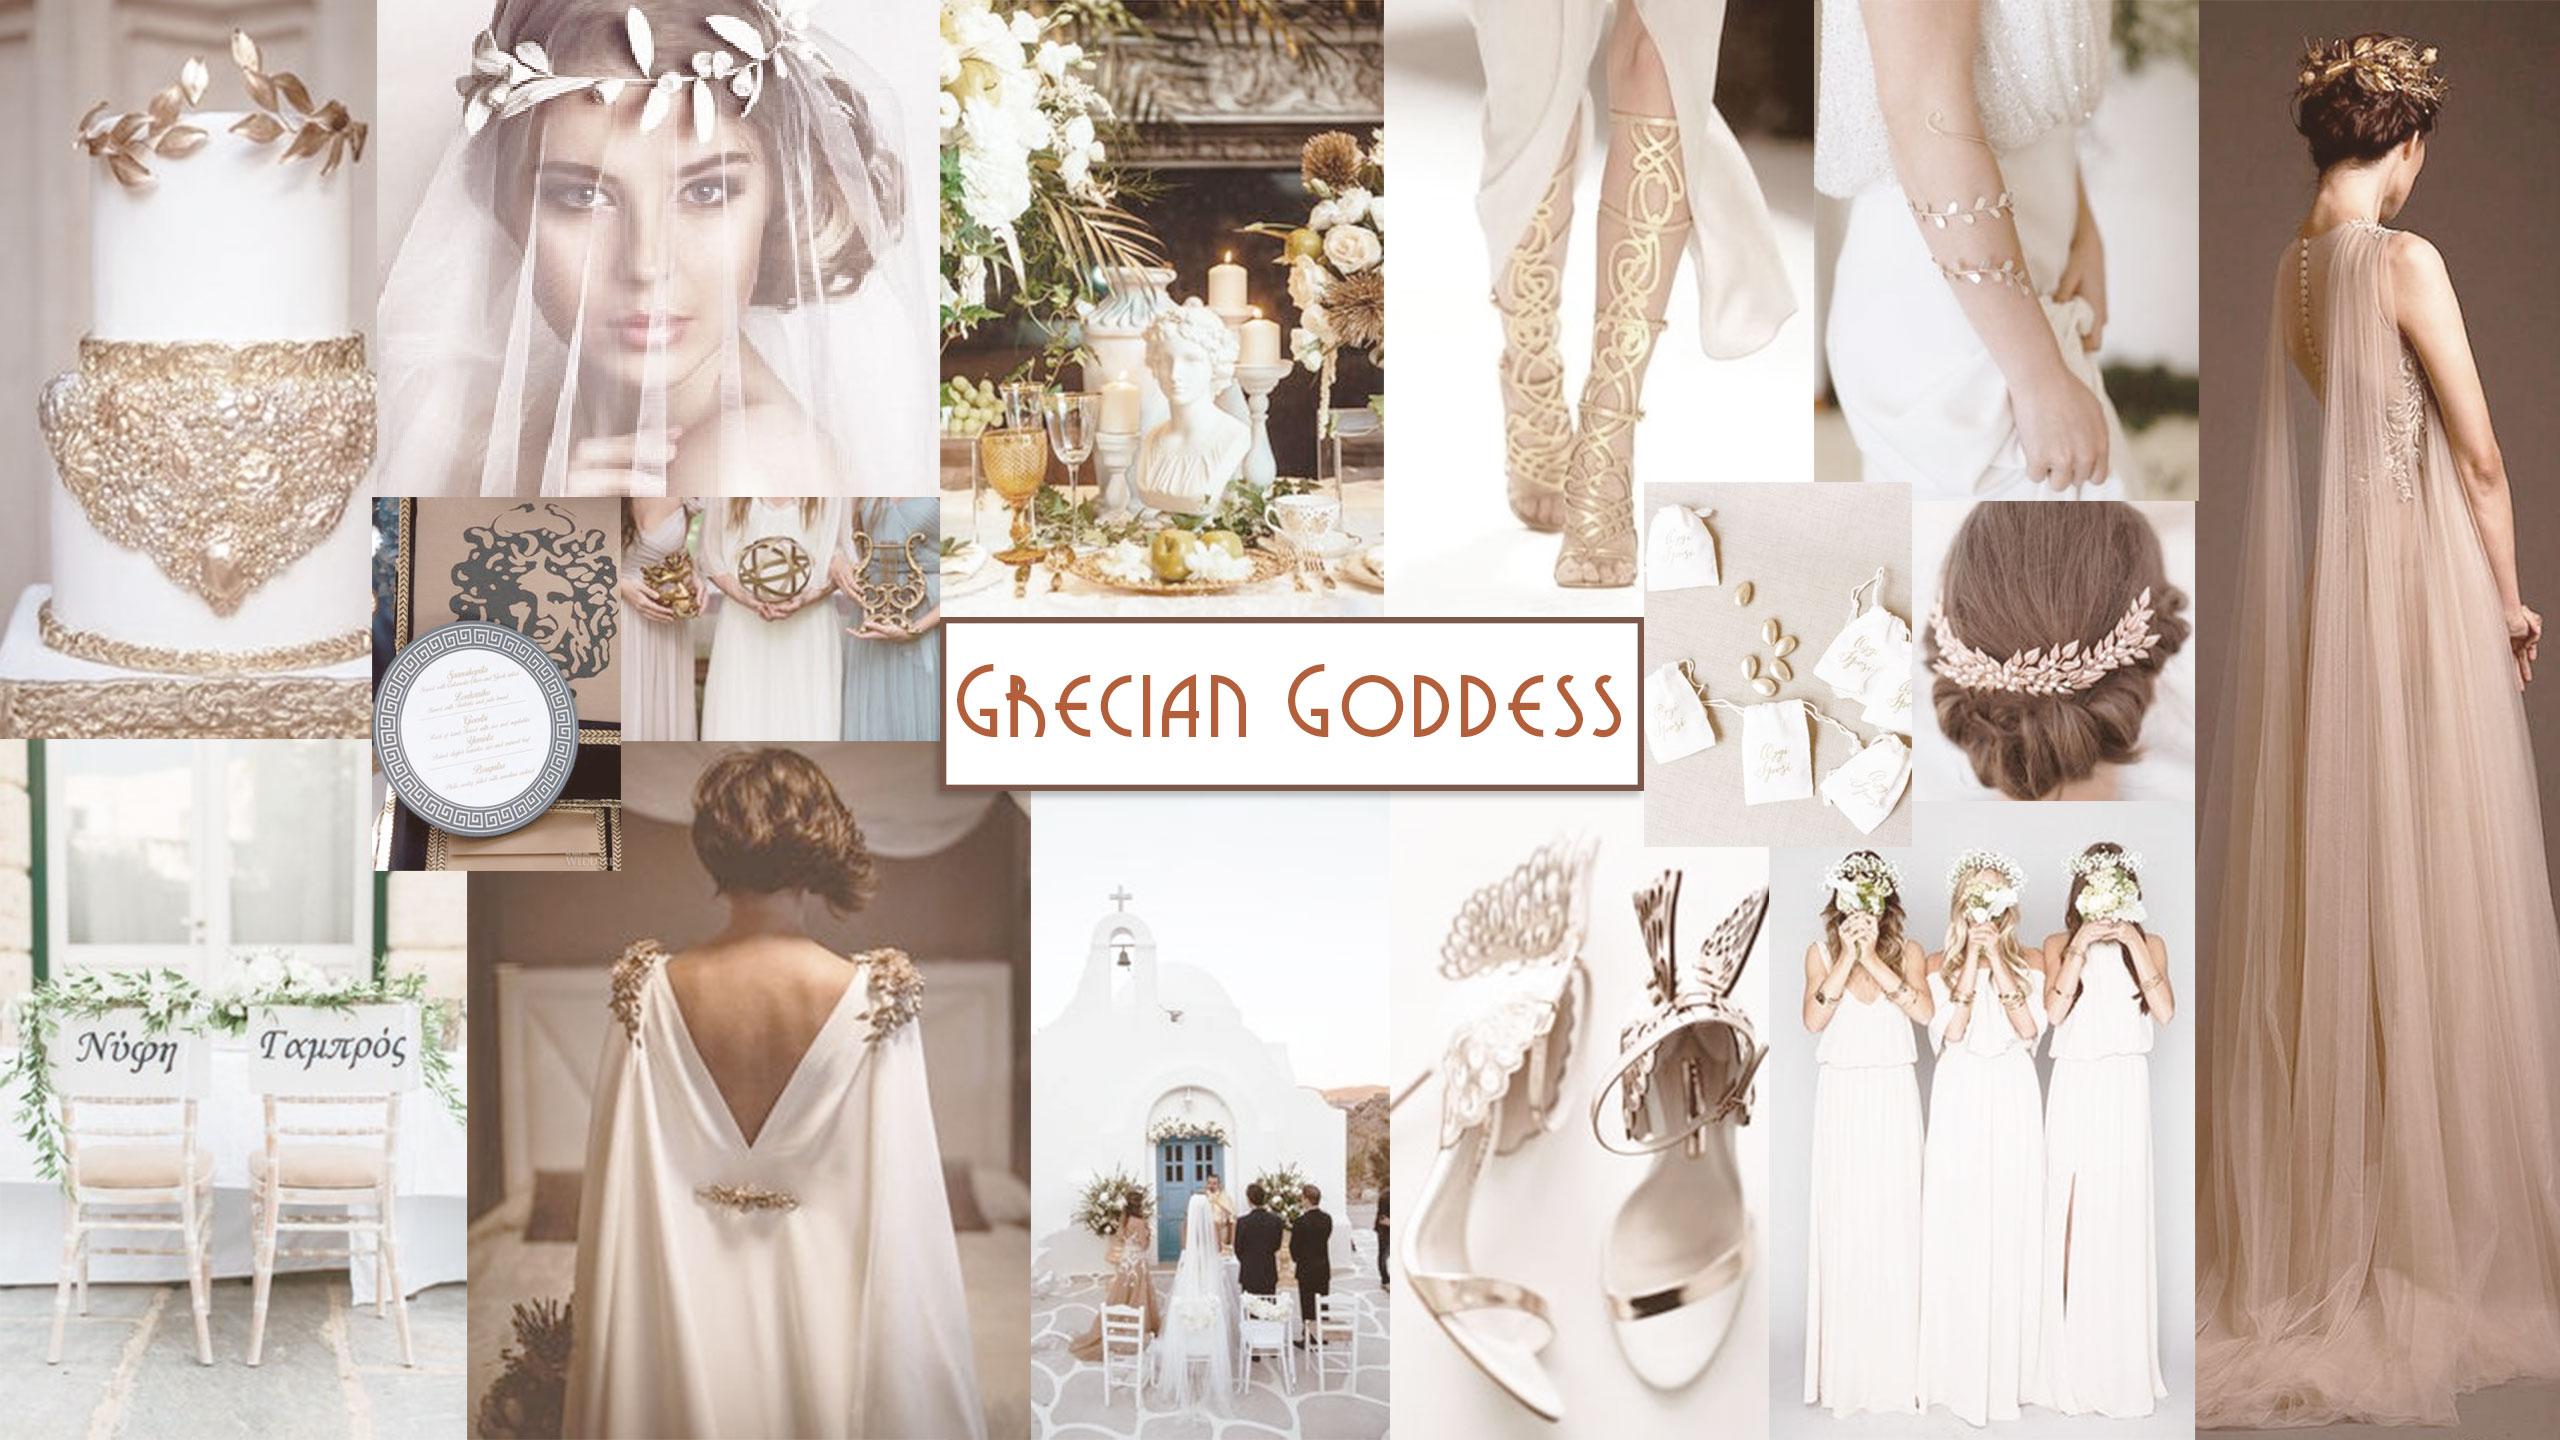 Awesome Gods And Goddesses Wedding Theme Images - The Wedding Ideas ...